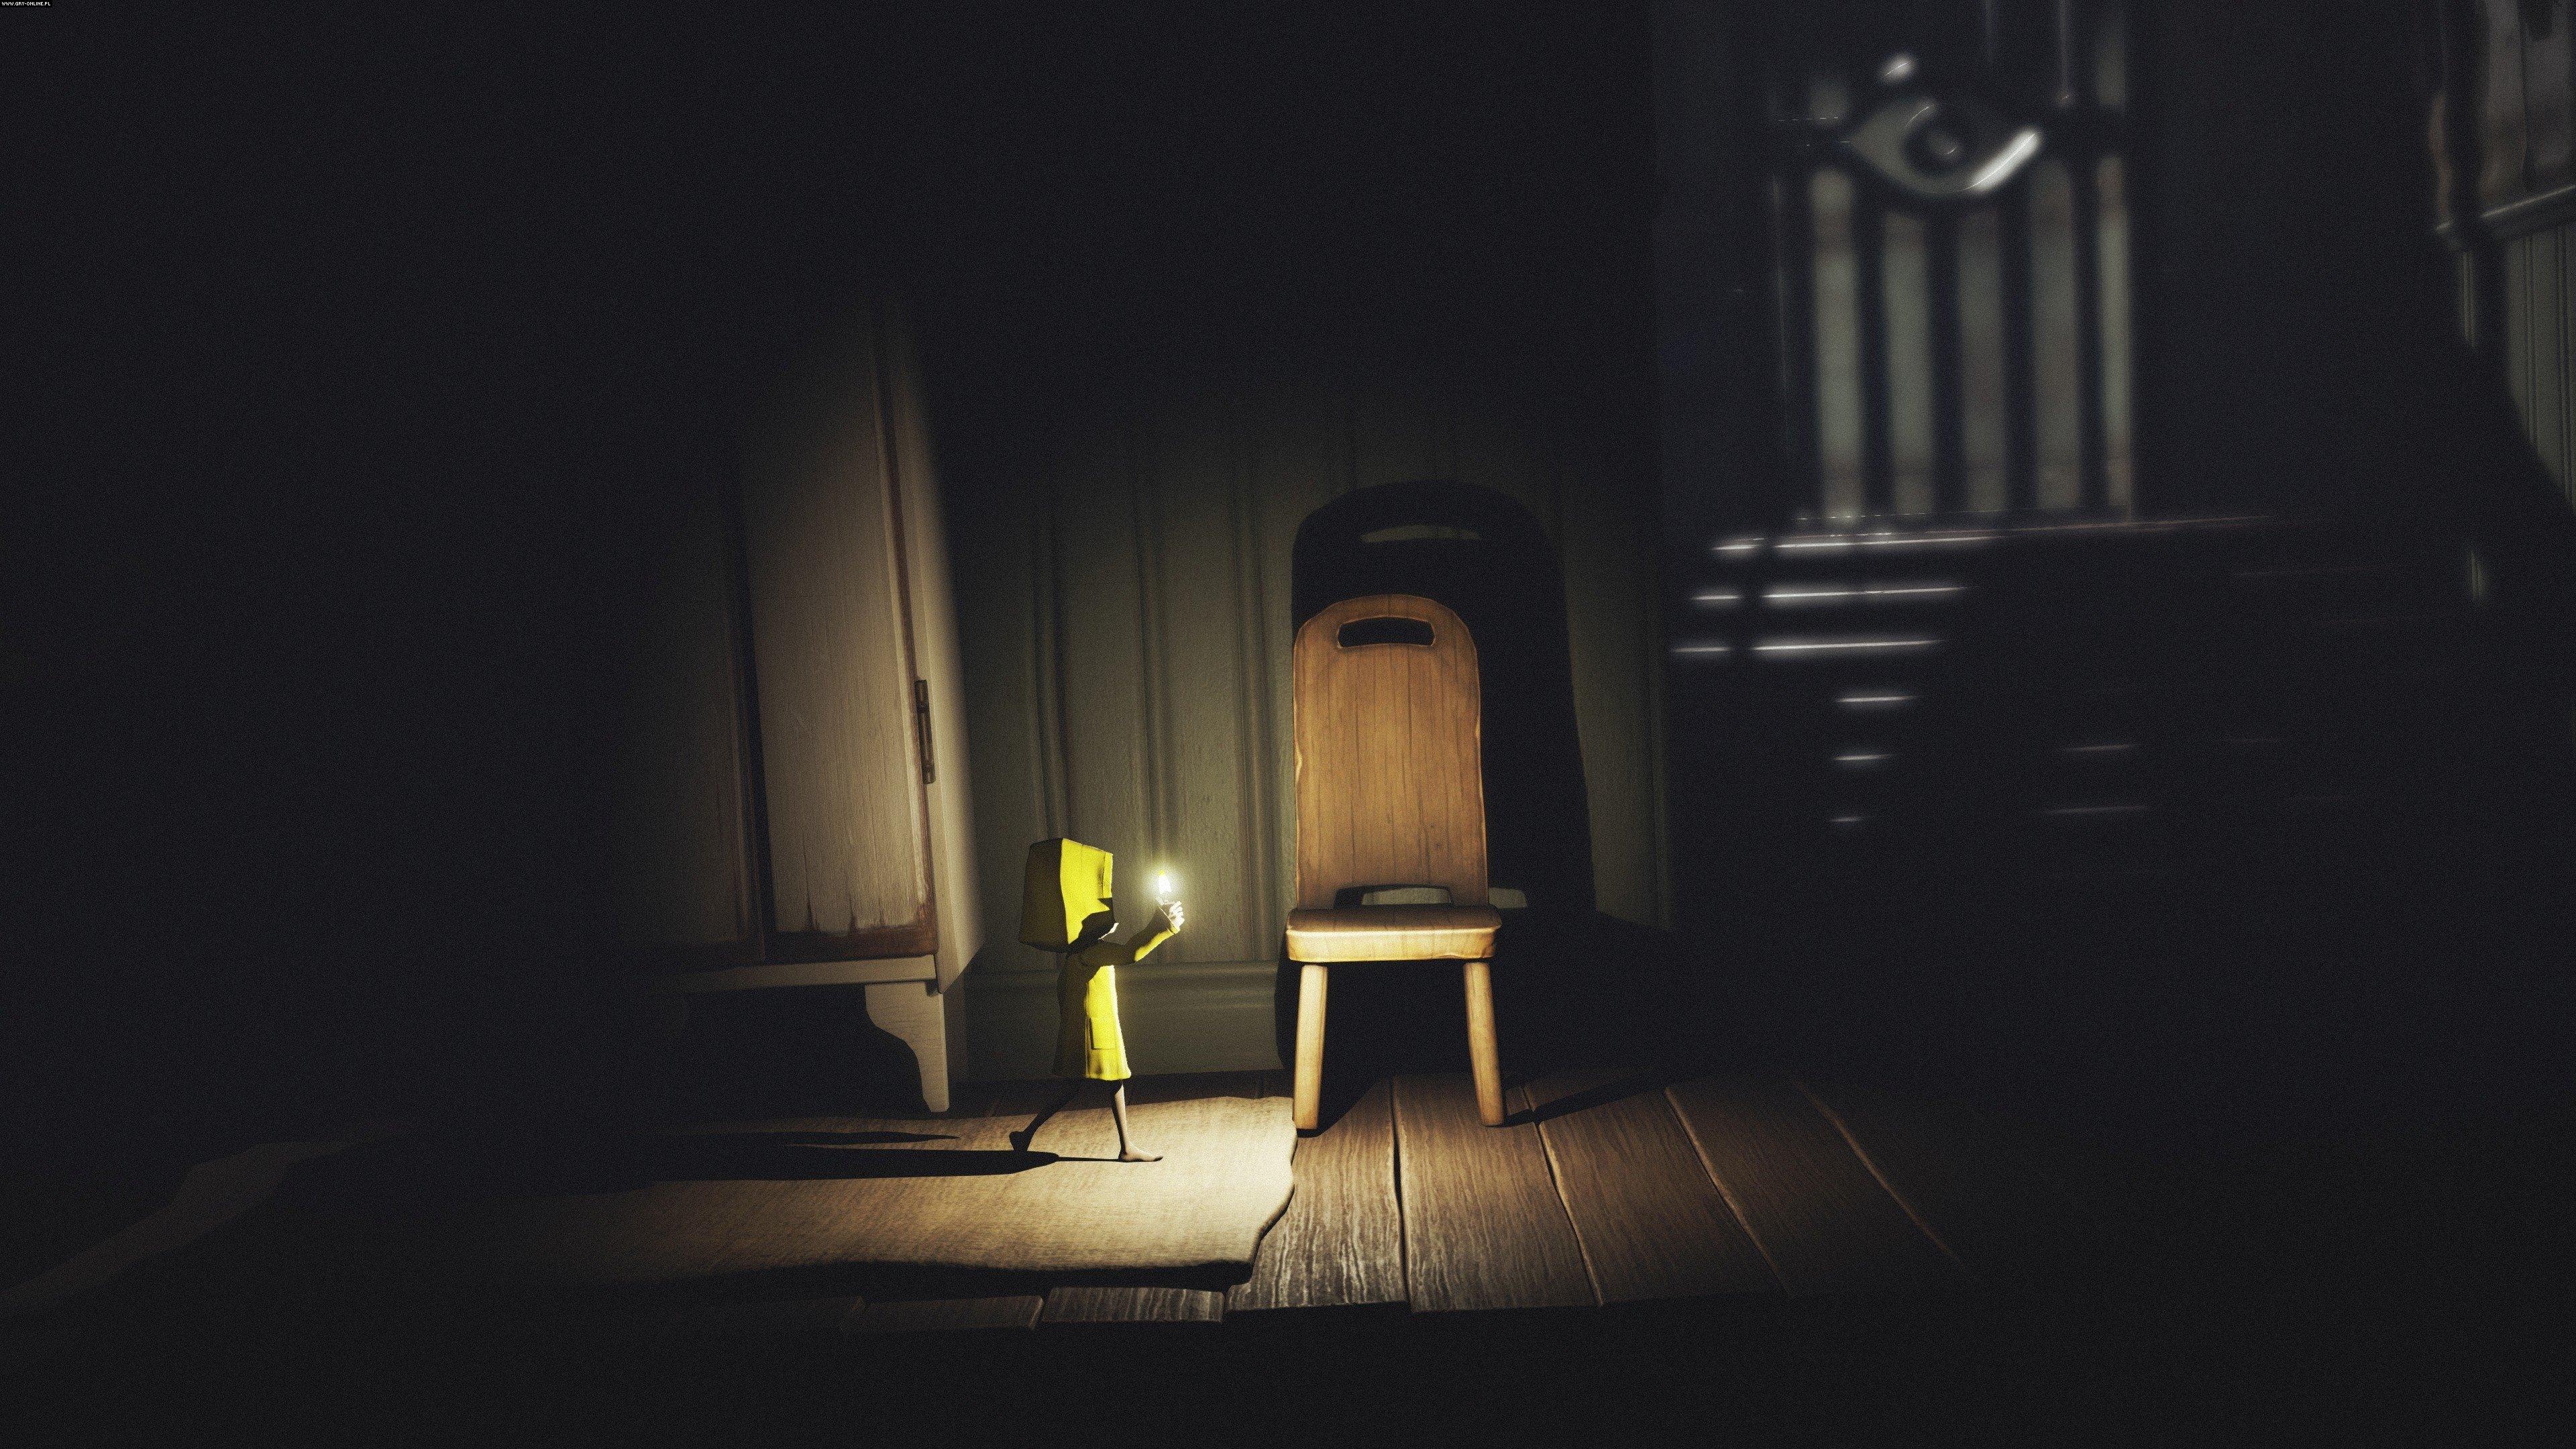 Little Nightmares PS4 Games Image 4/15, Tarsier Studios, Bandai Namco Entertainment